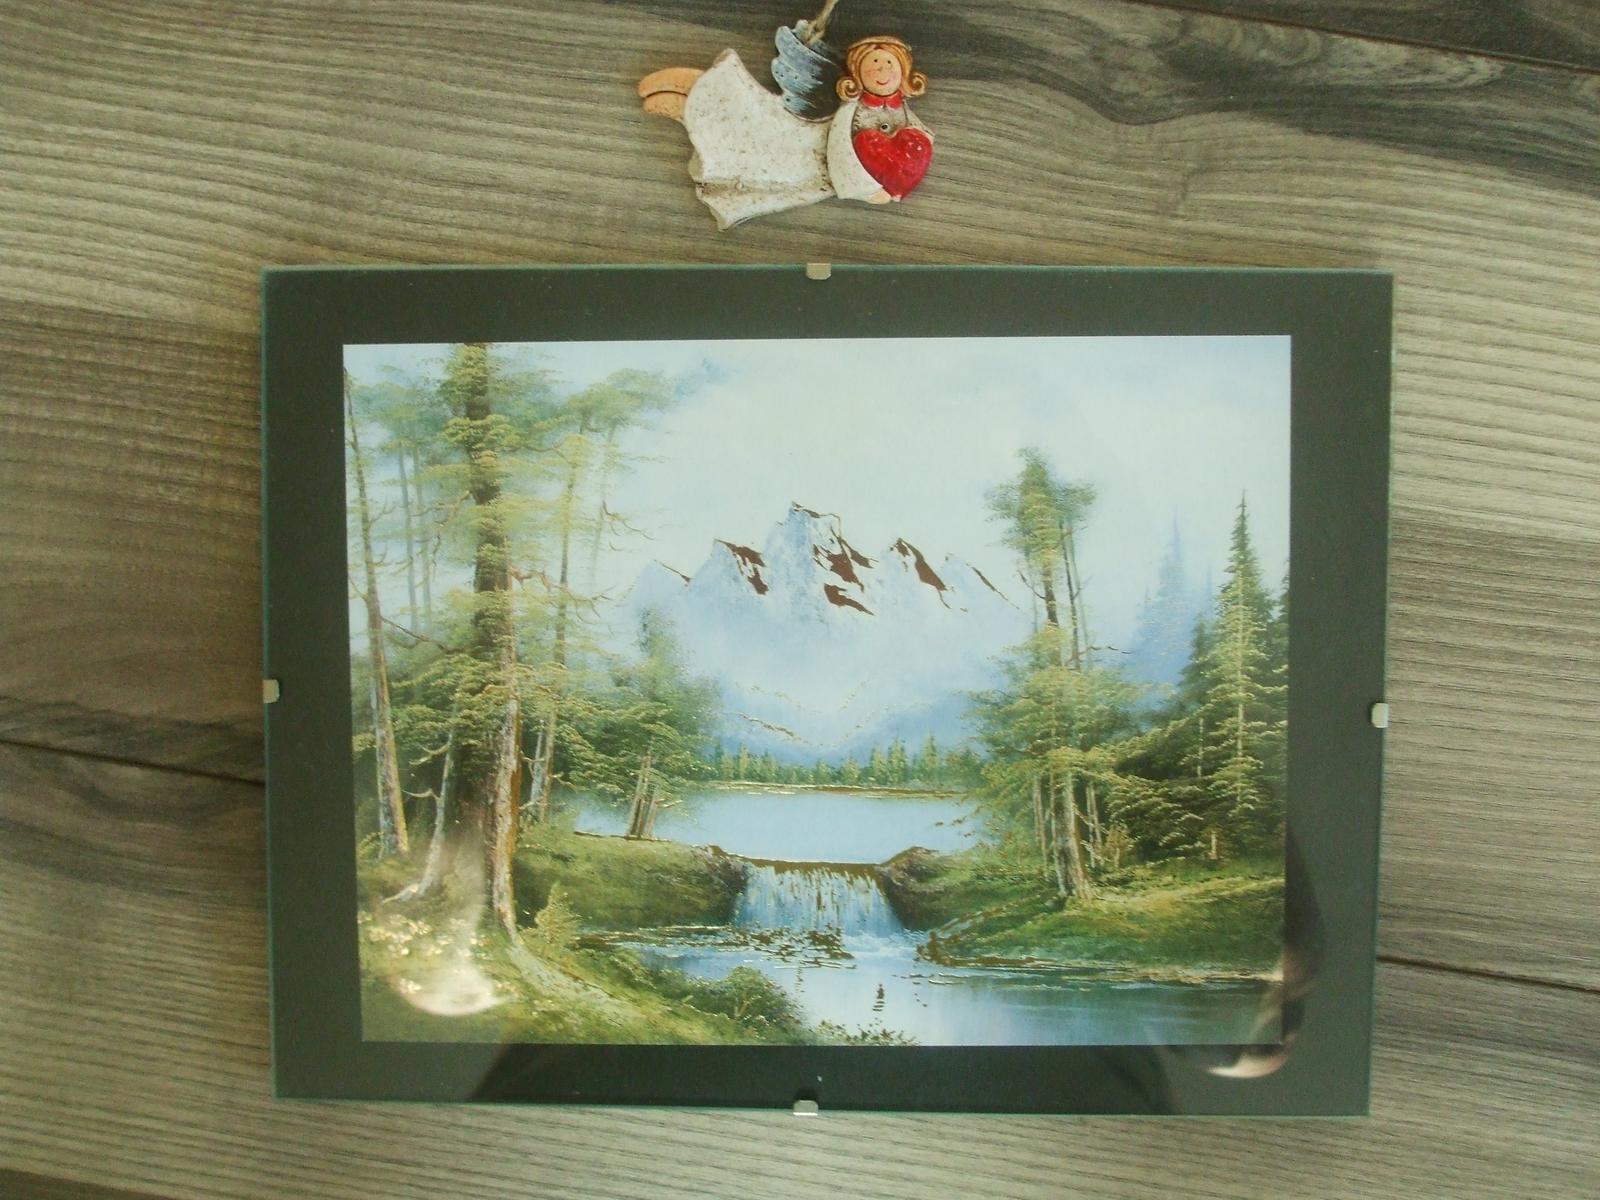 Obraz v skle 24 x 18 cm-top stav - Obrázok č. 1